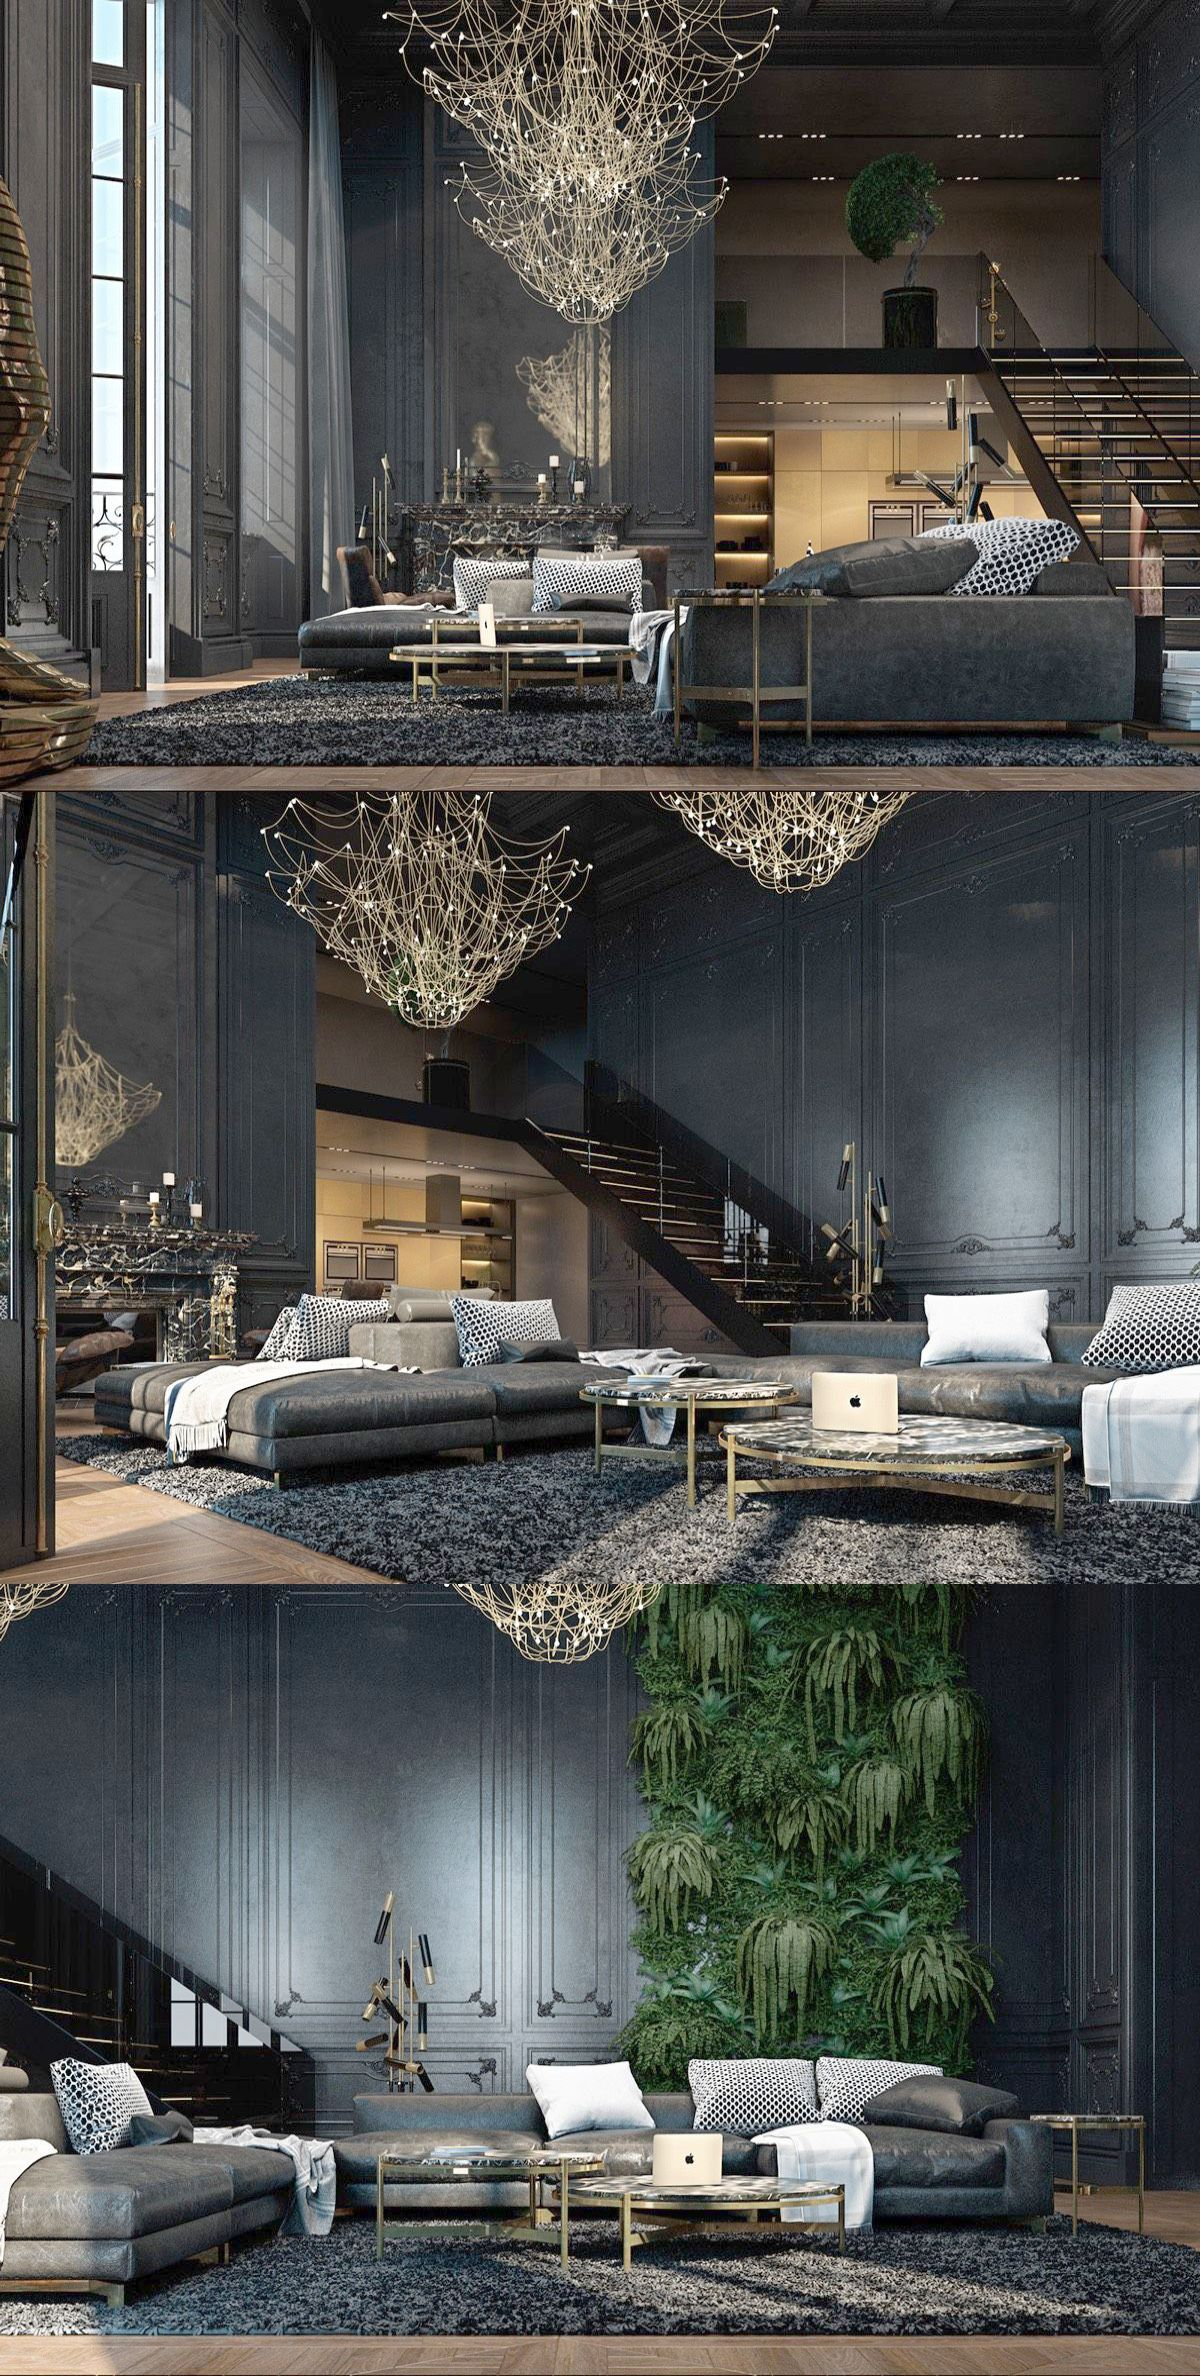 Living Room Interior Design Photo Gallery In Nigeria Renovation